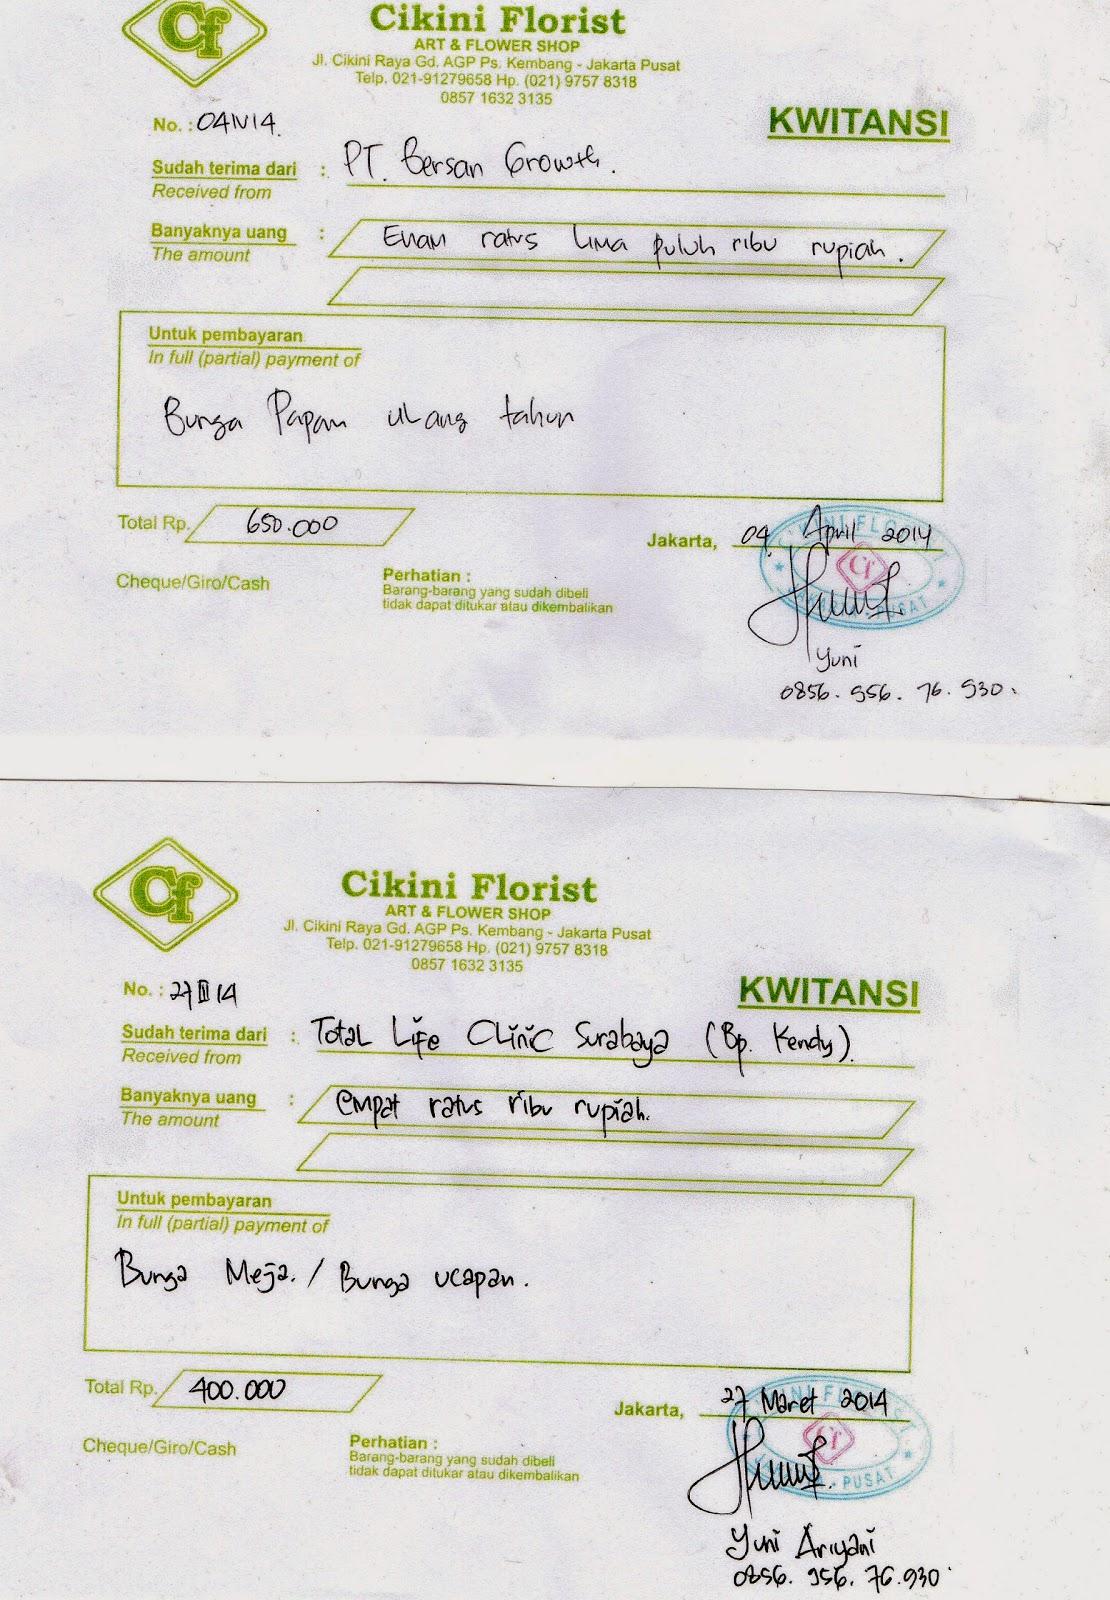 Toko Bunga Cikiniflorist Jakarta Kwitansi Asli Toko Bunga